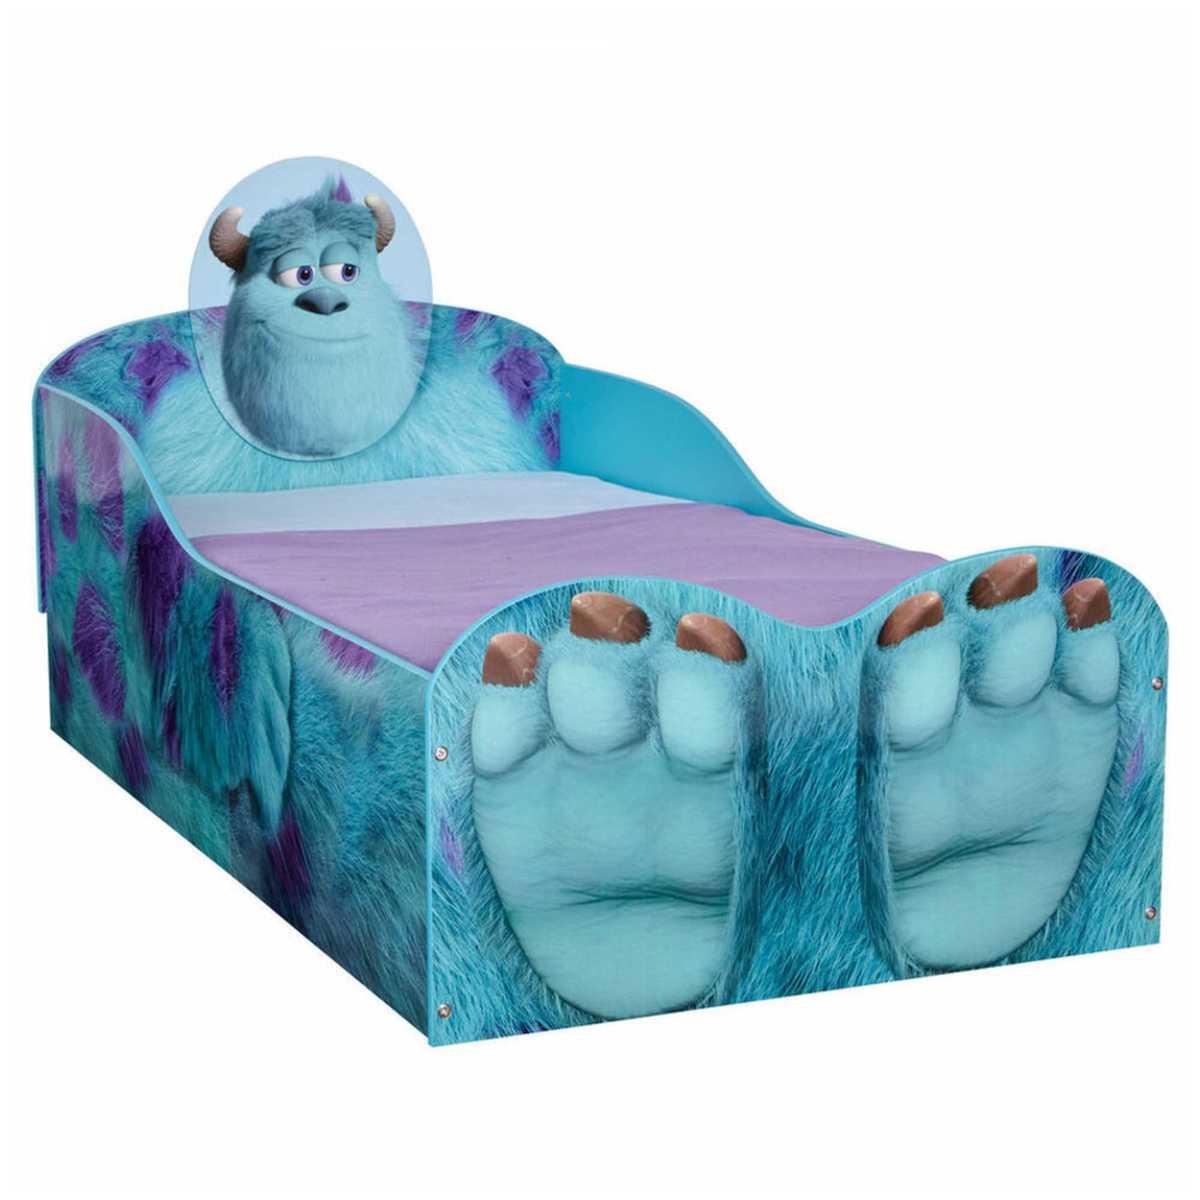 Disney Monsters Inc University Toddler Bed